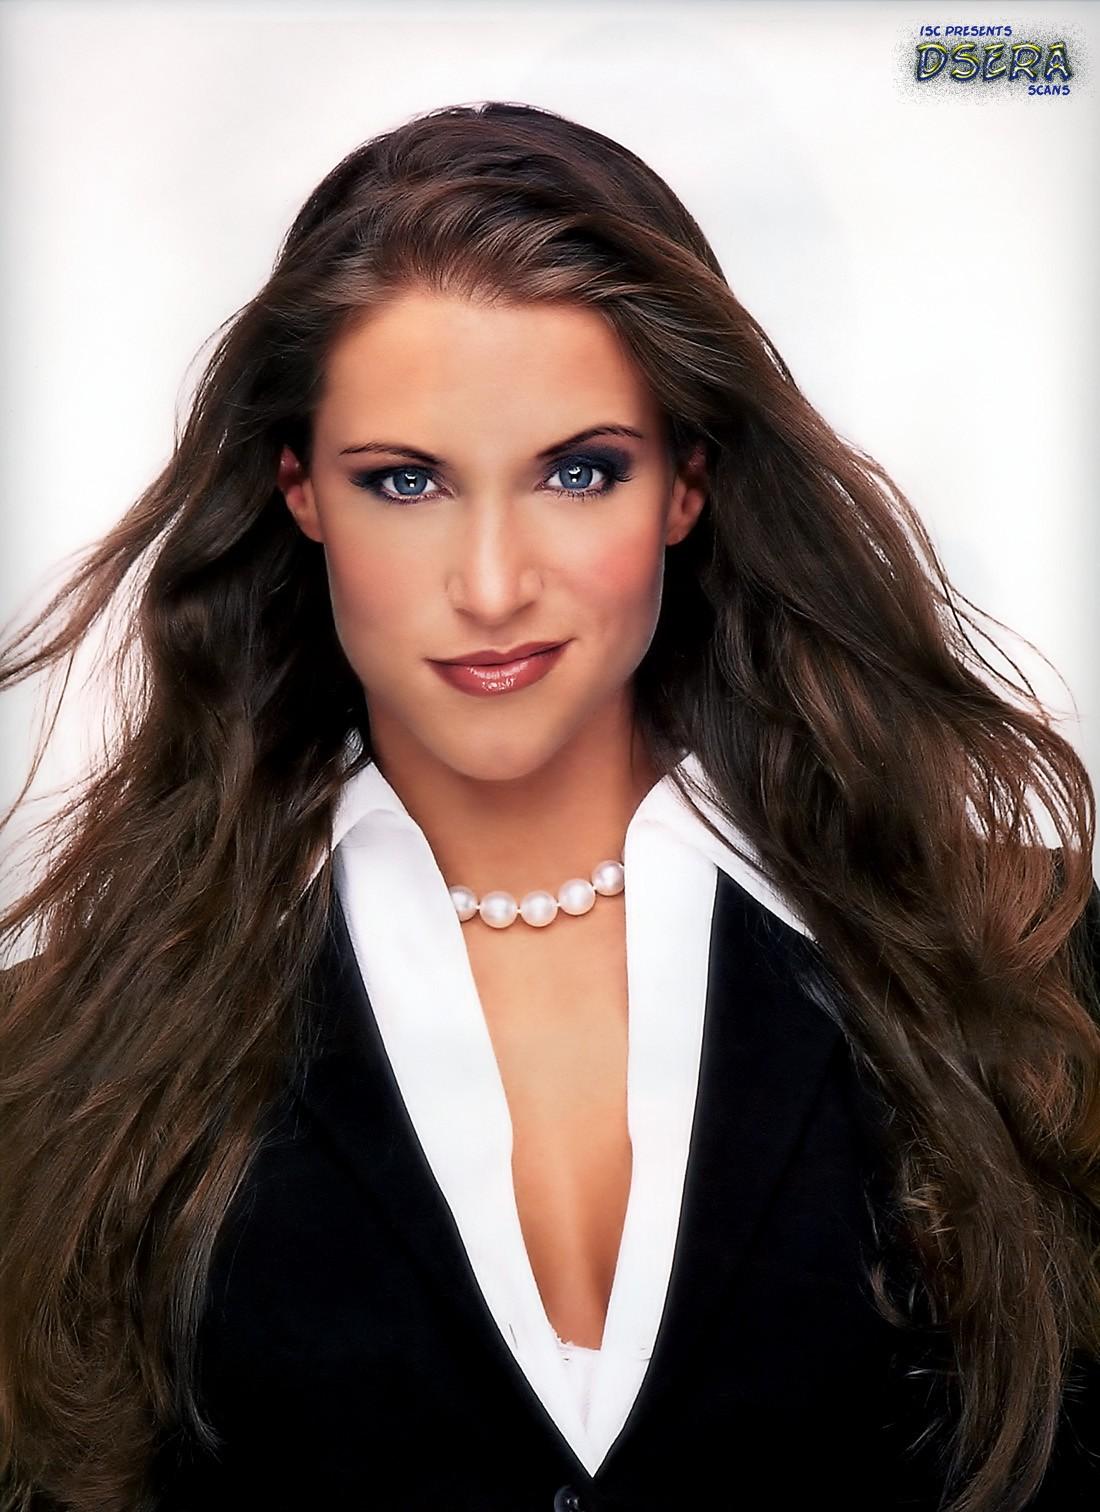 Wrestler Stephanie McMahon  - age: 45